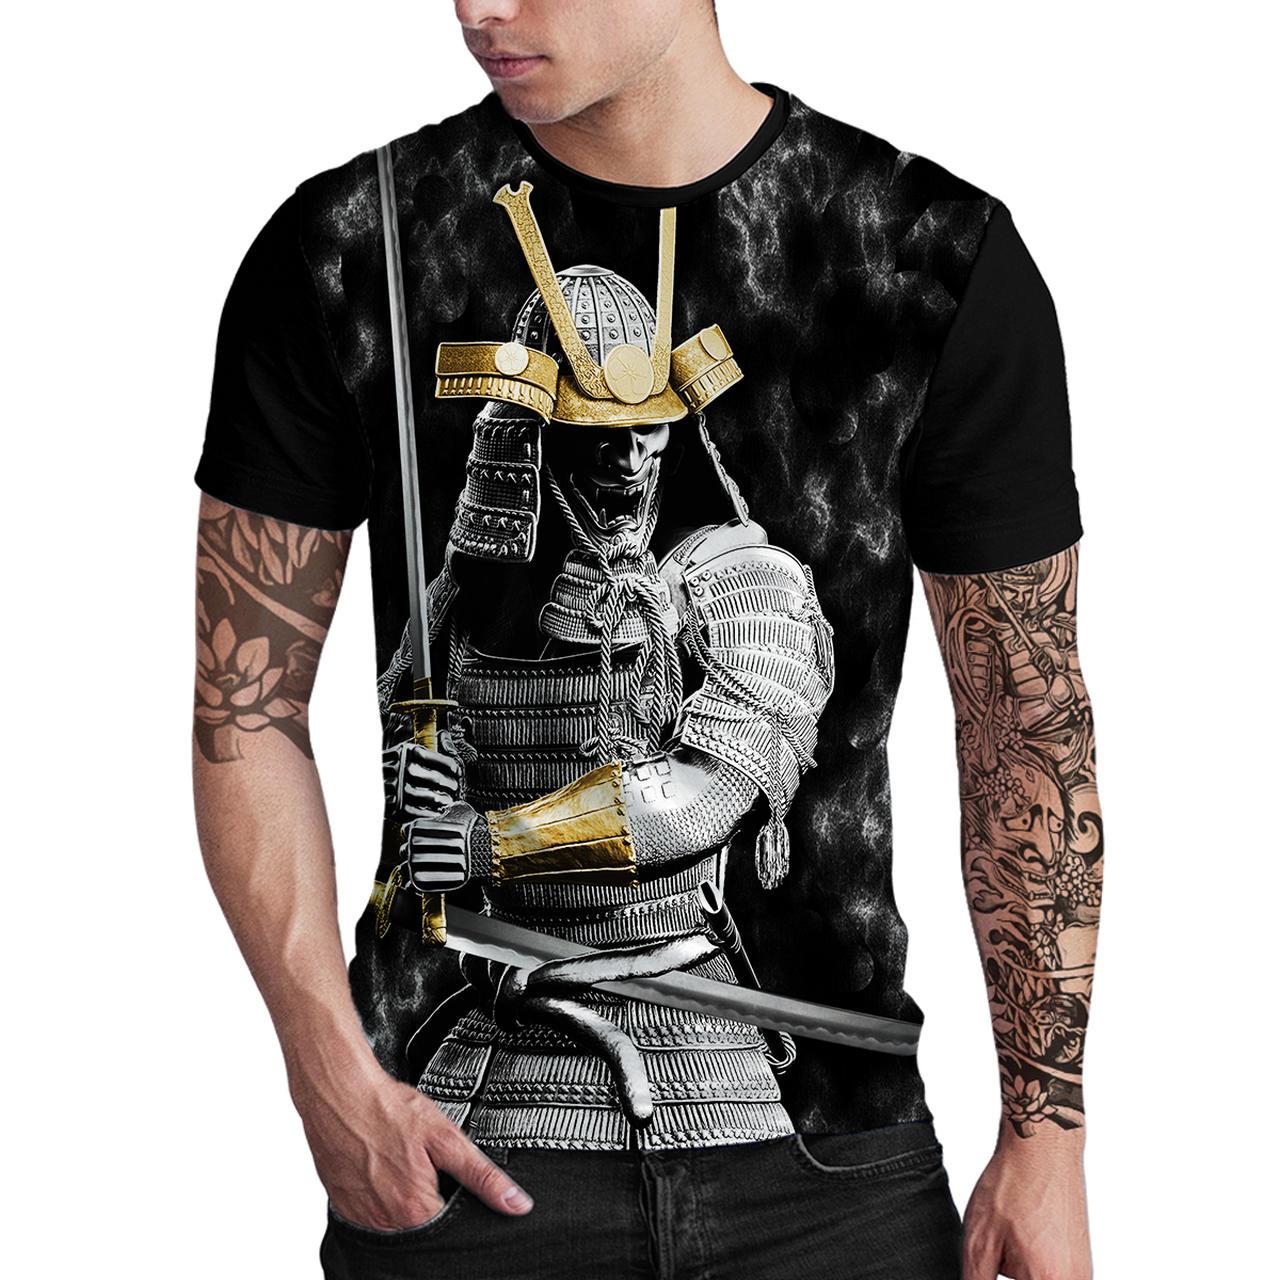 Stompy Camiseta Estampada Masculina Modelo 137